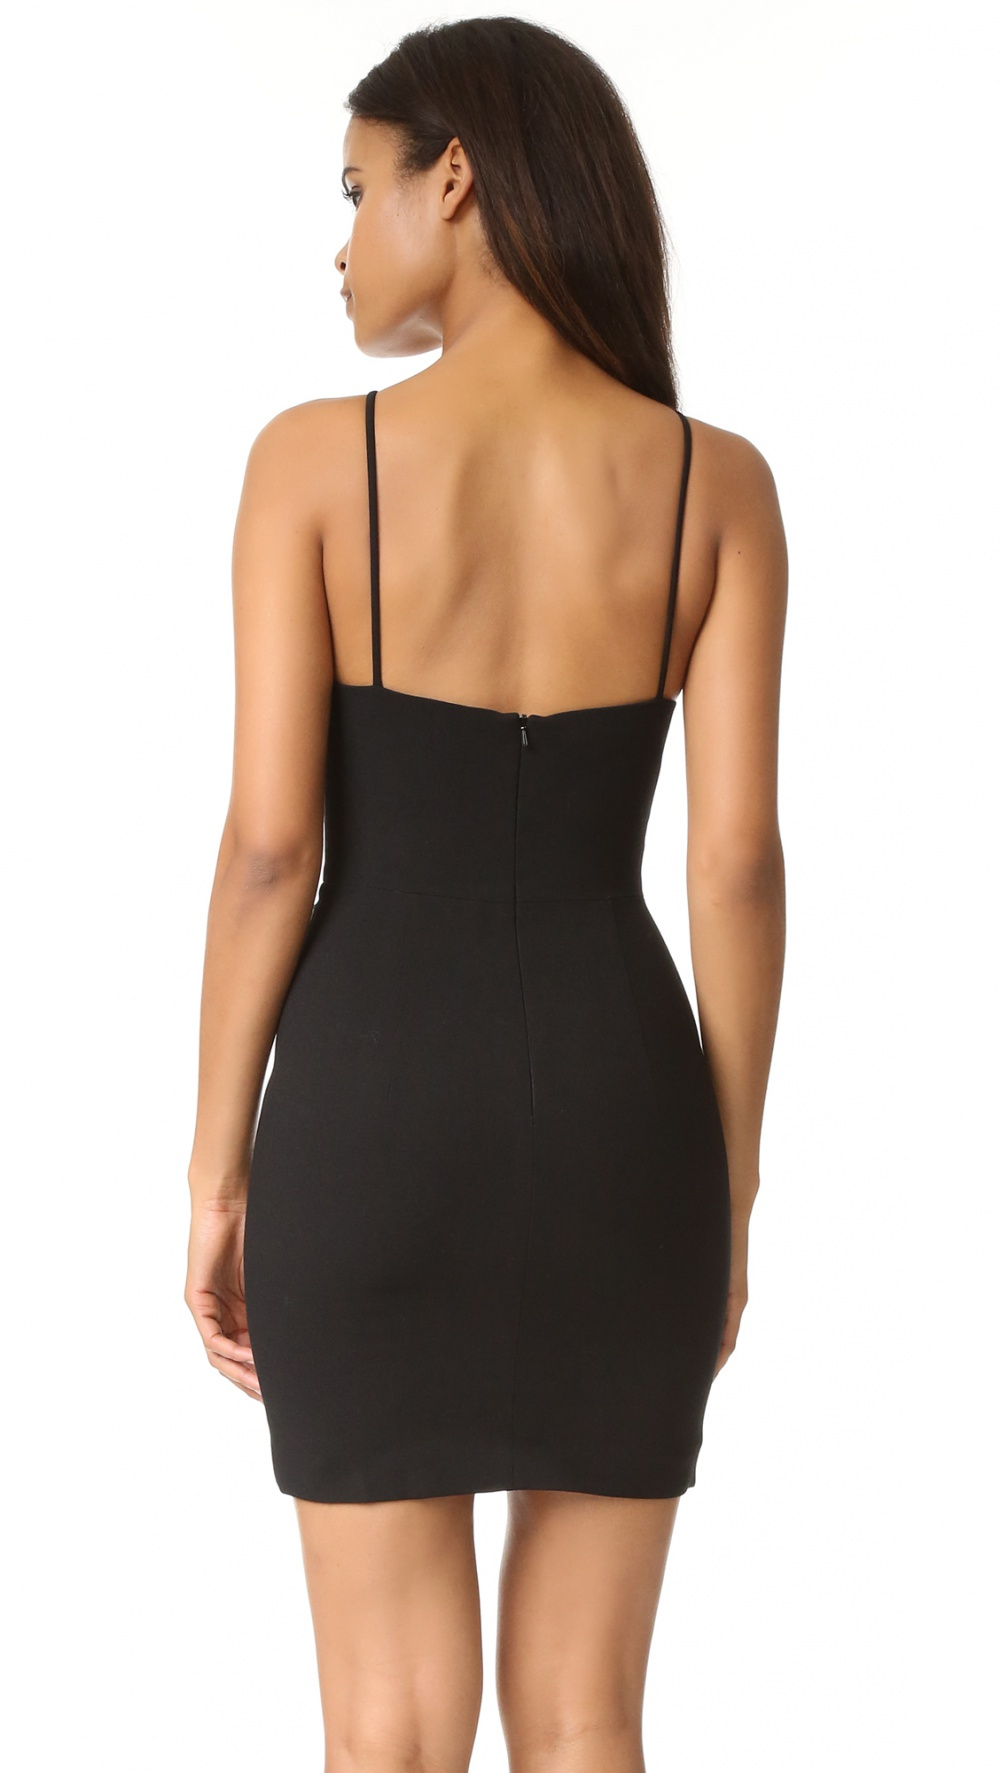 Мини-платье Bermuda,Black Halo, размер 0